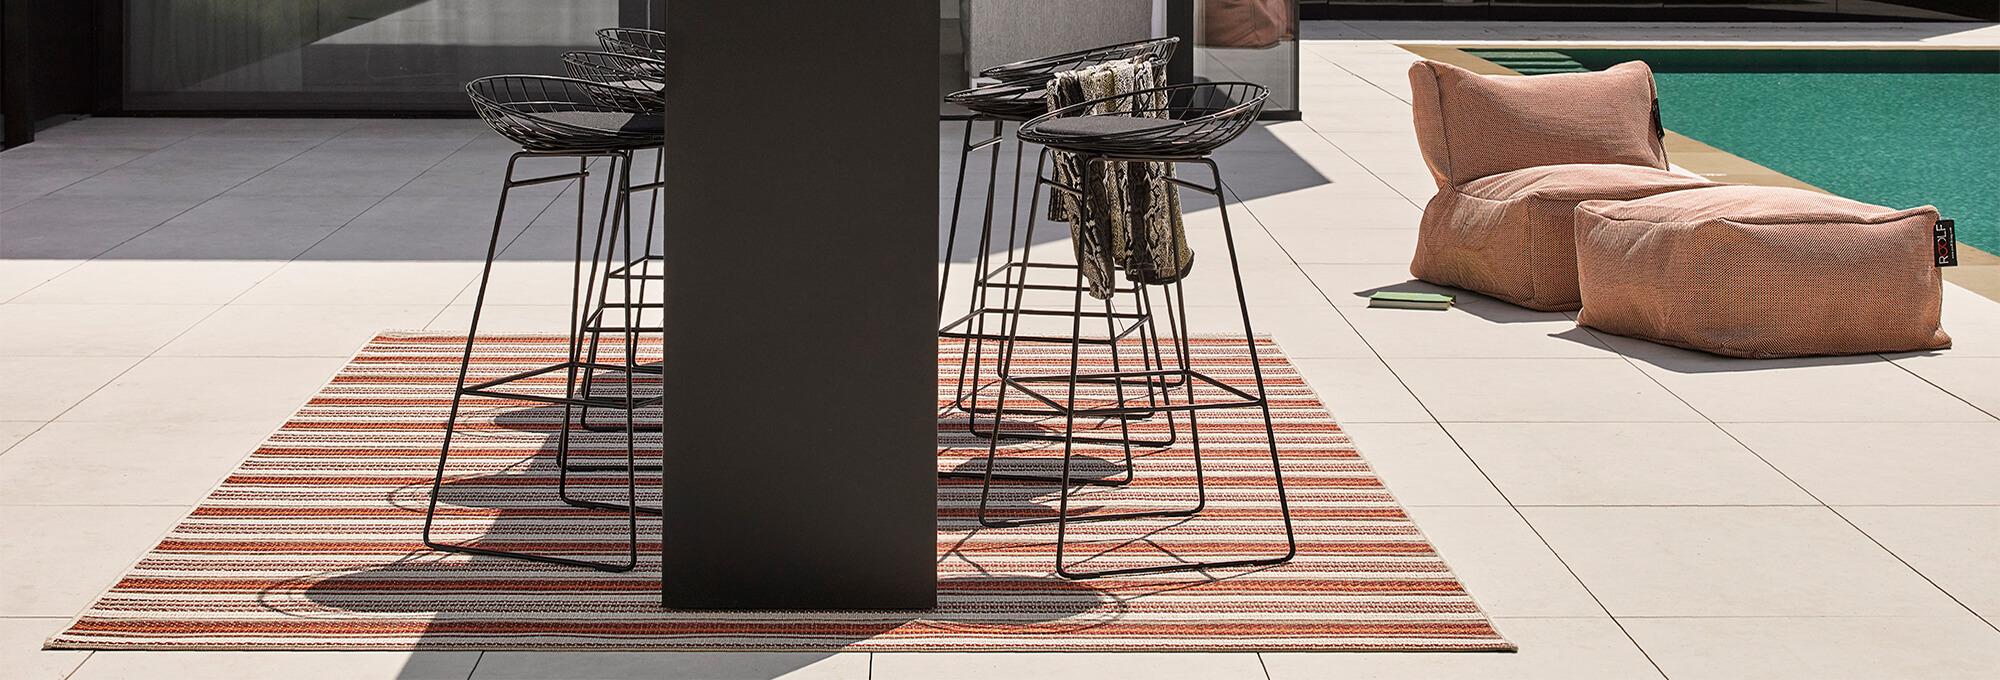 dywany-hurtowania